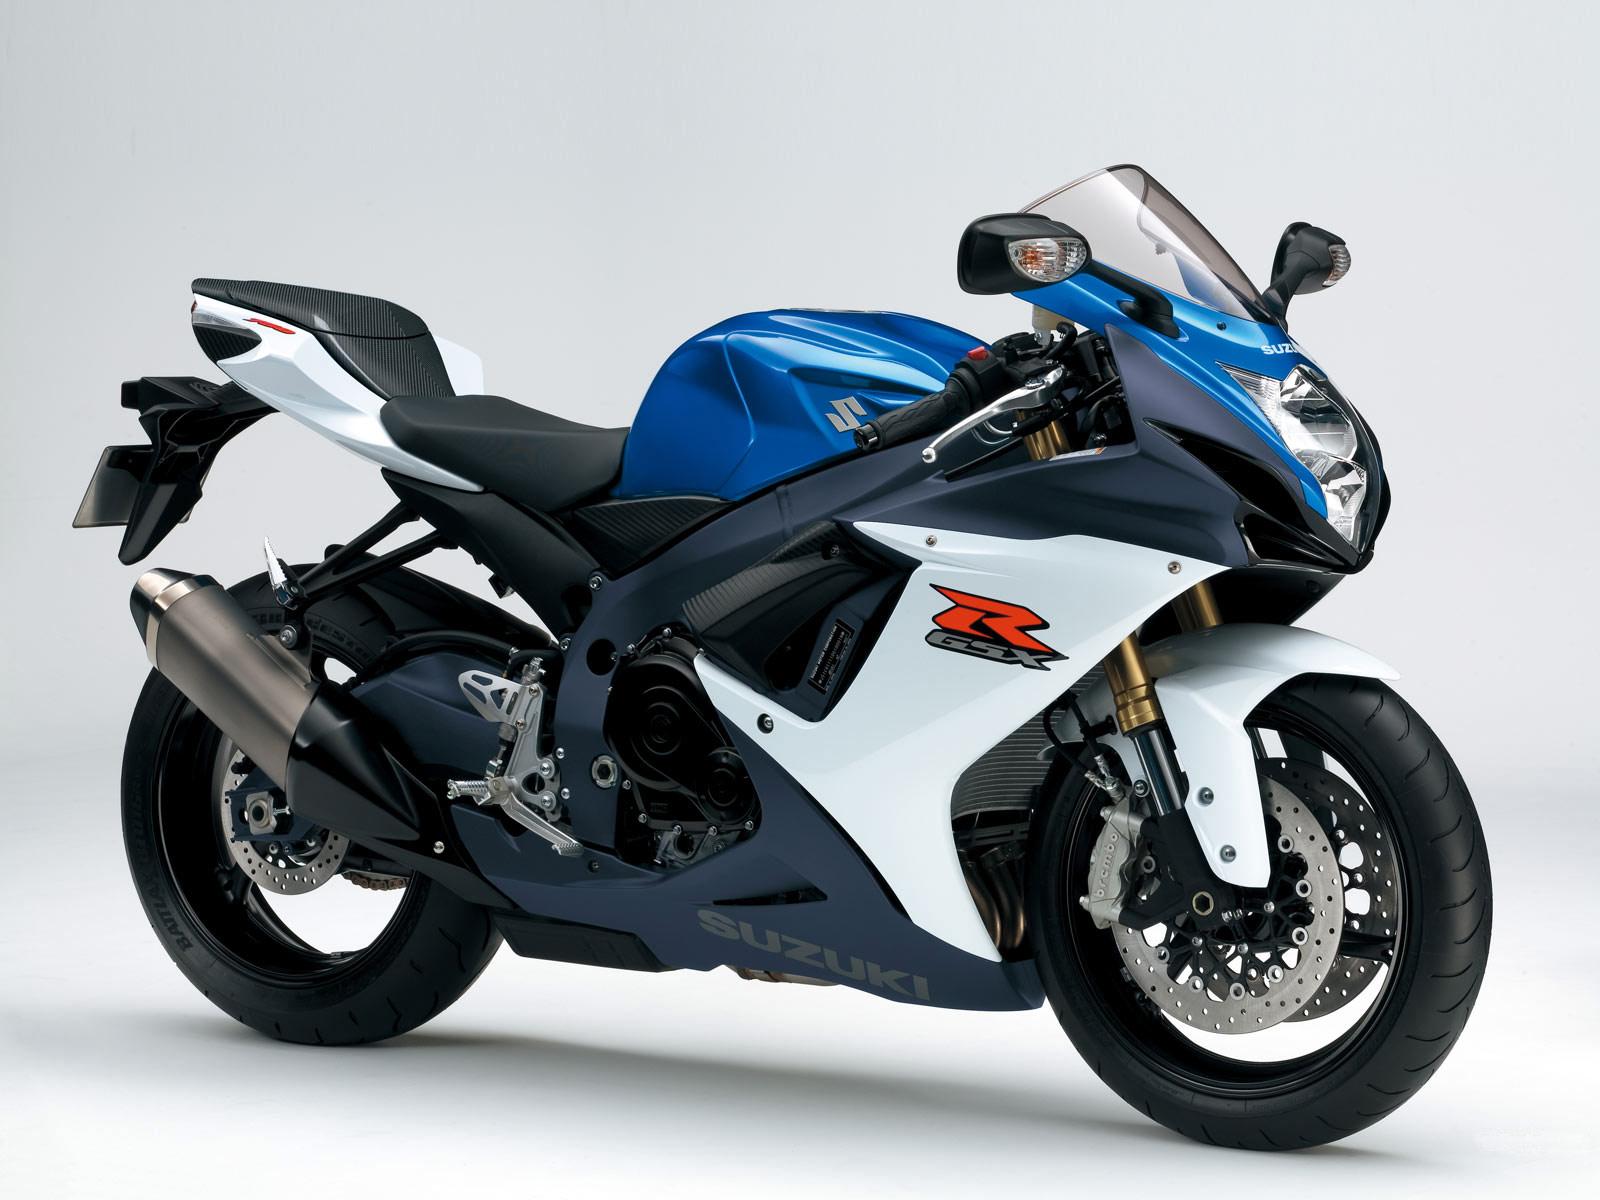 http://2.bp.blogspot.com/-O7IbefYMqPE/TuVPOiQTFwI/AAAAAAAAFMw/M7K3uFV54Qw/s1600/2011_Suzuki_GSX-R_750_motorcycle-desktop-wallpaper_05.jpg